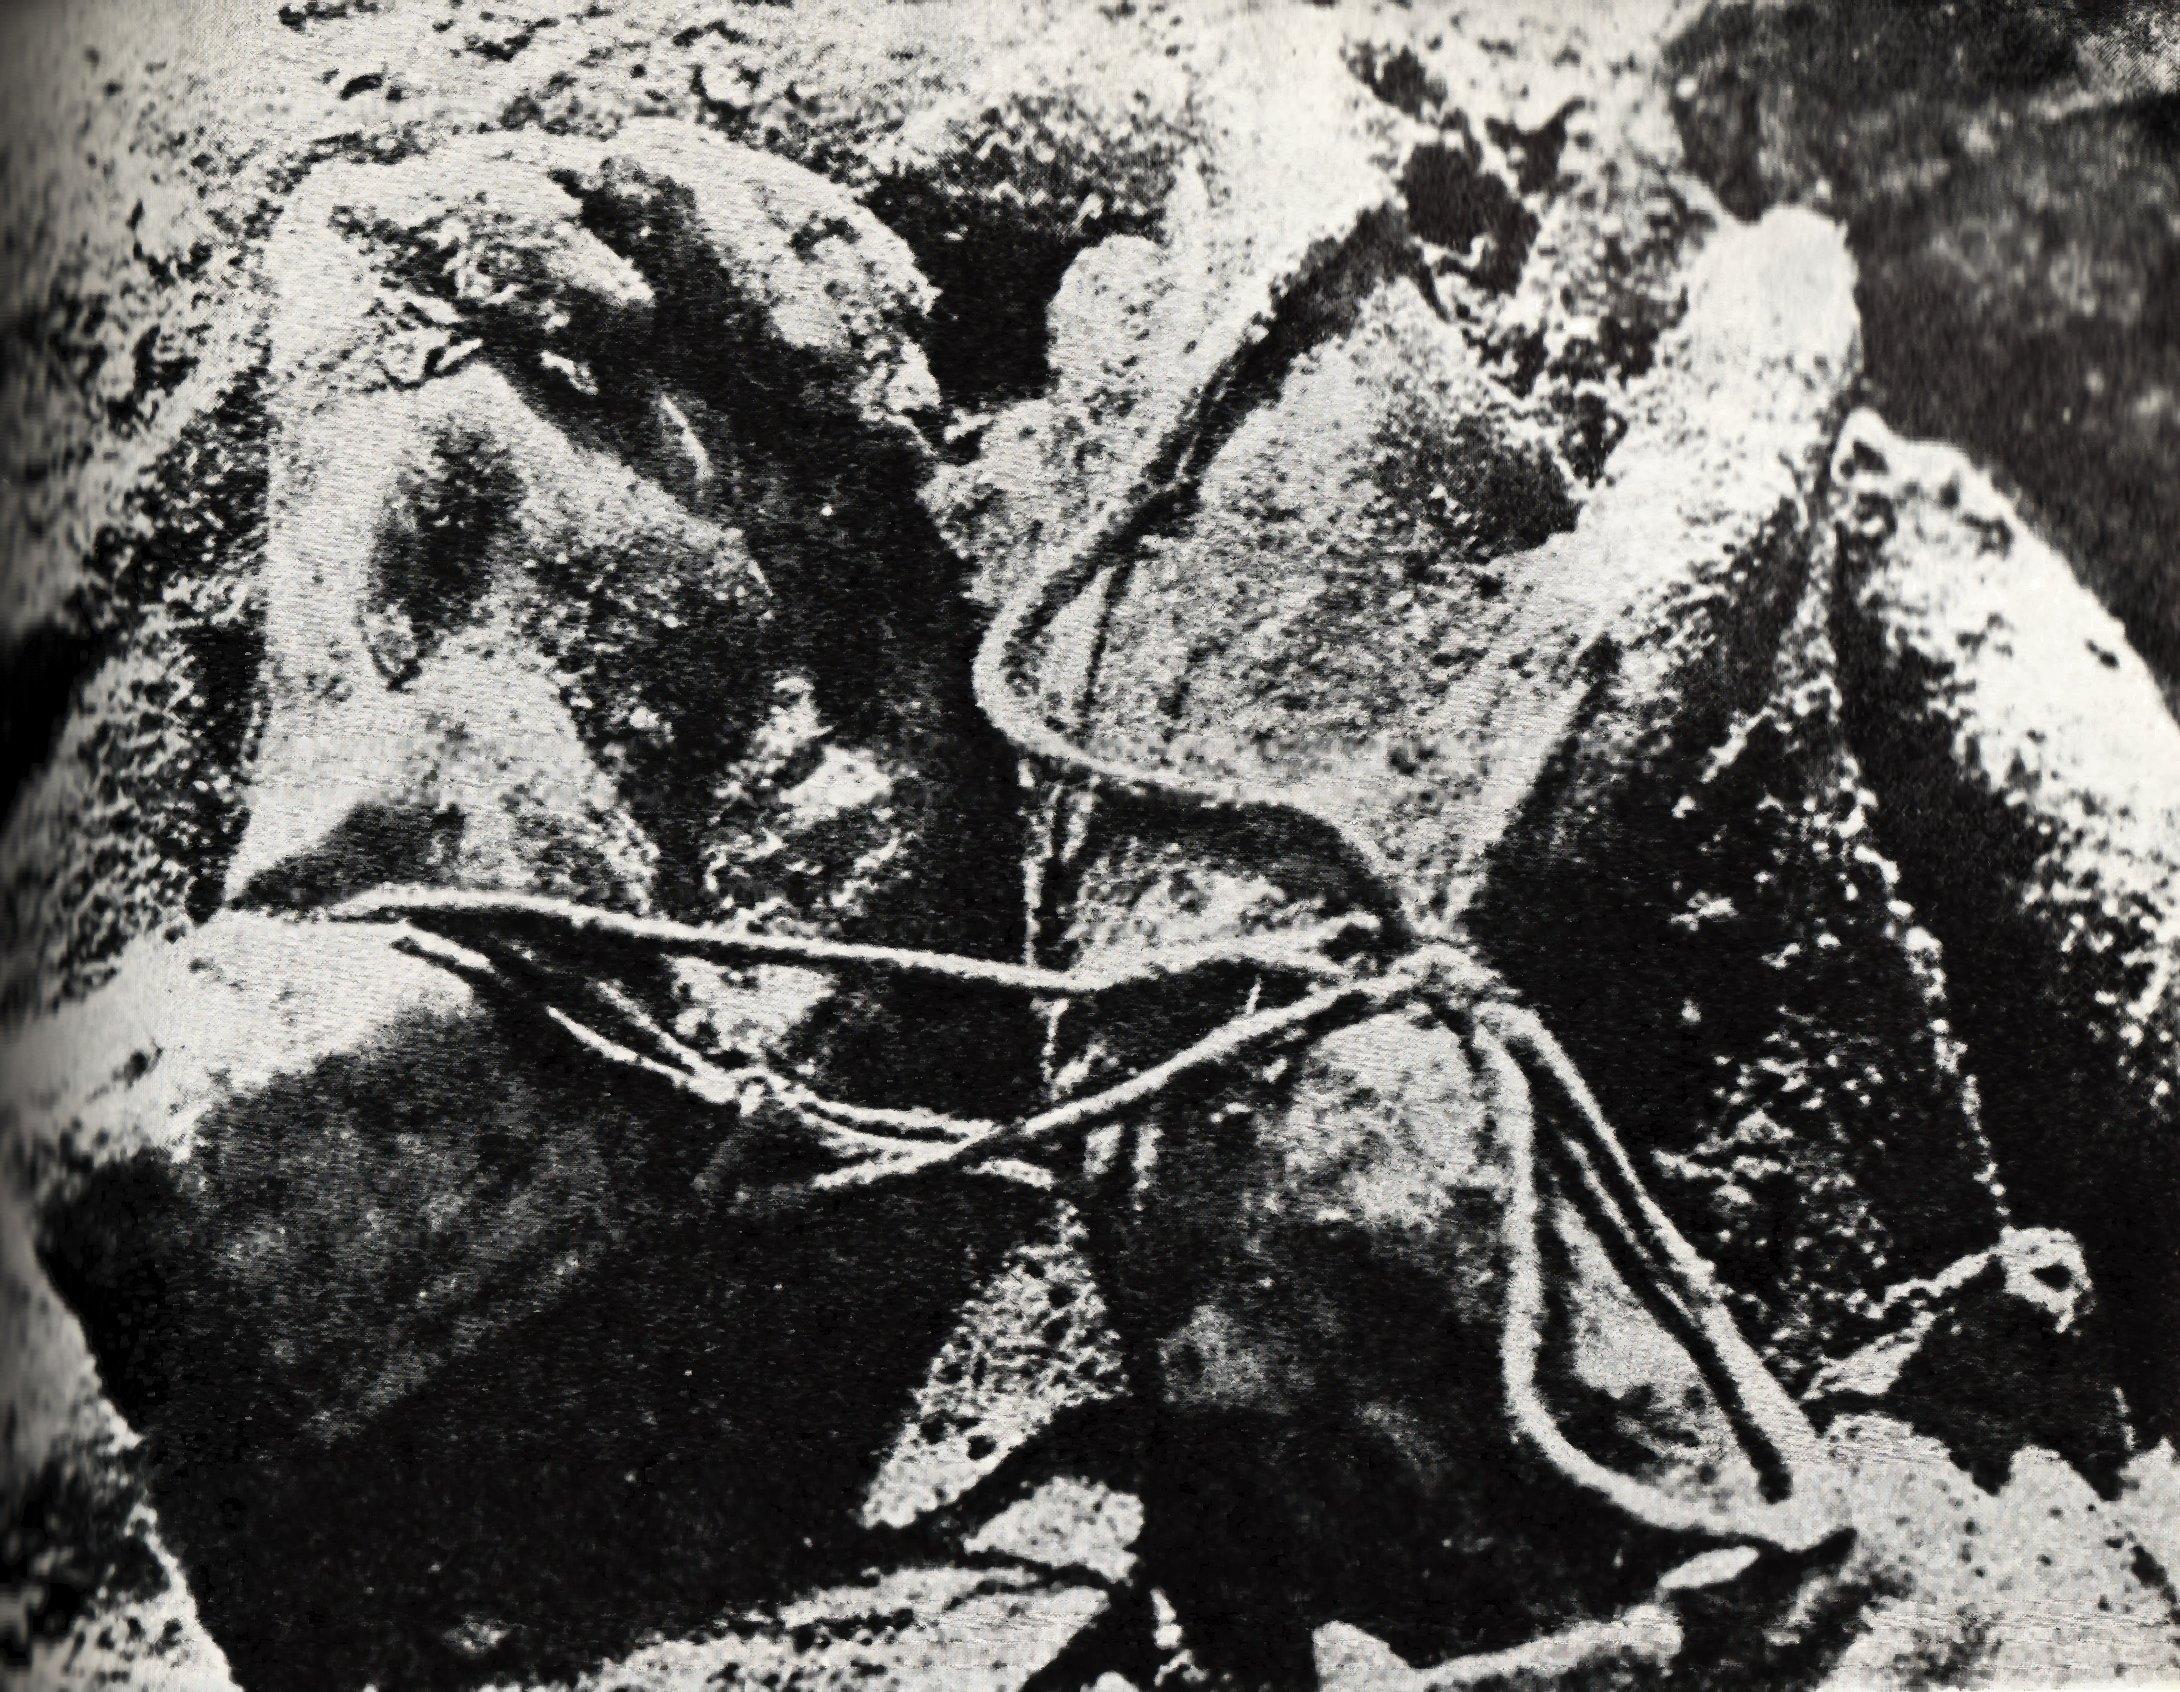 https://i0.wp.com/upload.wikimedia.org/wikipedia/commons/8/8c/Katyn_massacre.jpg